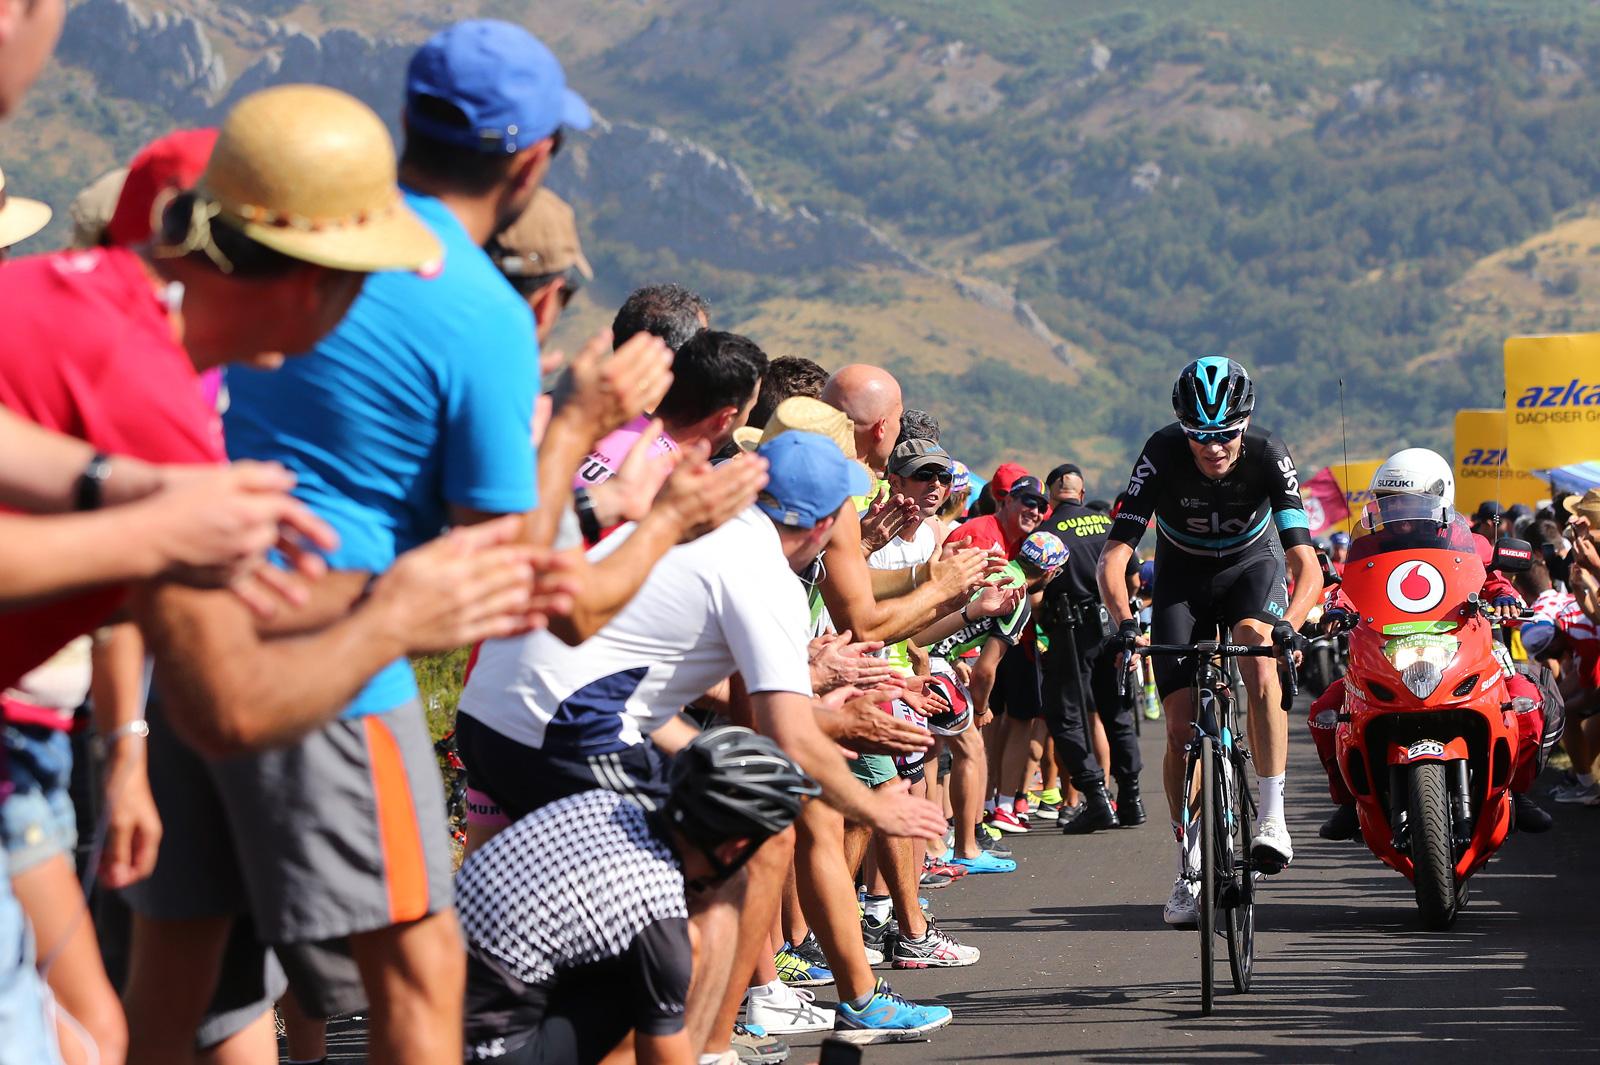 Chris Froome during the Vuelta a España race, August 27, 2016